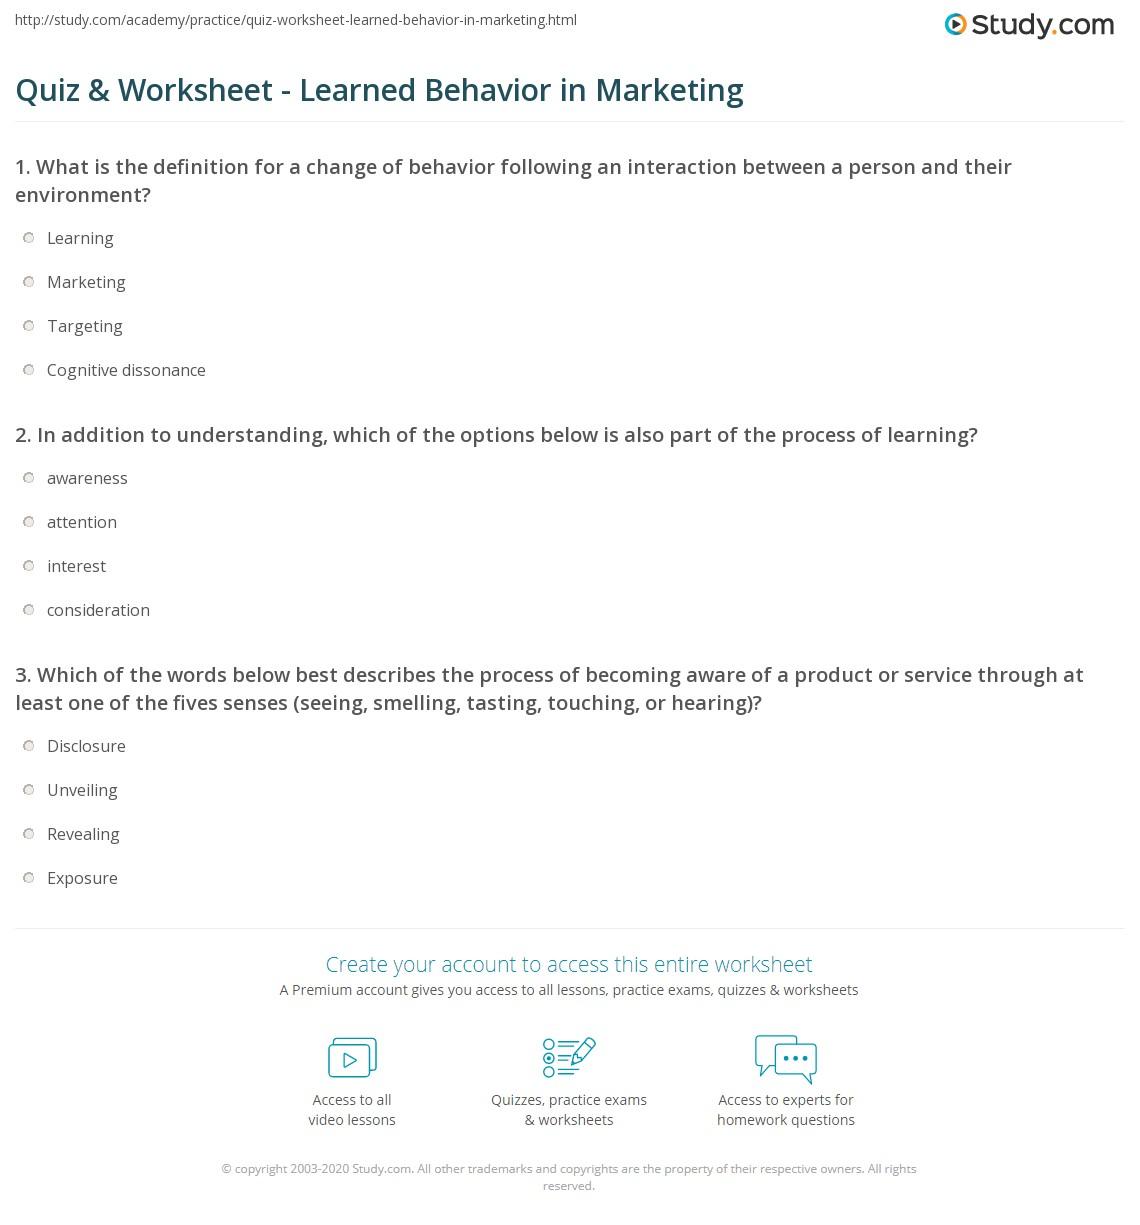 Quiz Worksheet Learned Behavior In Marketing Study